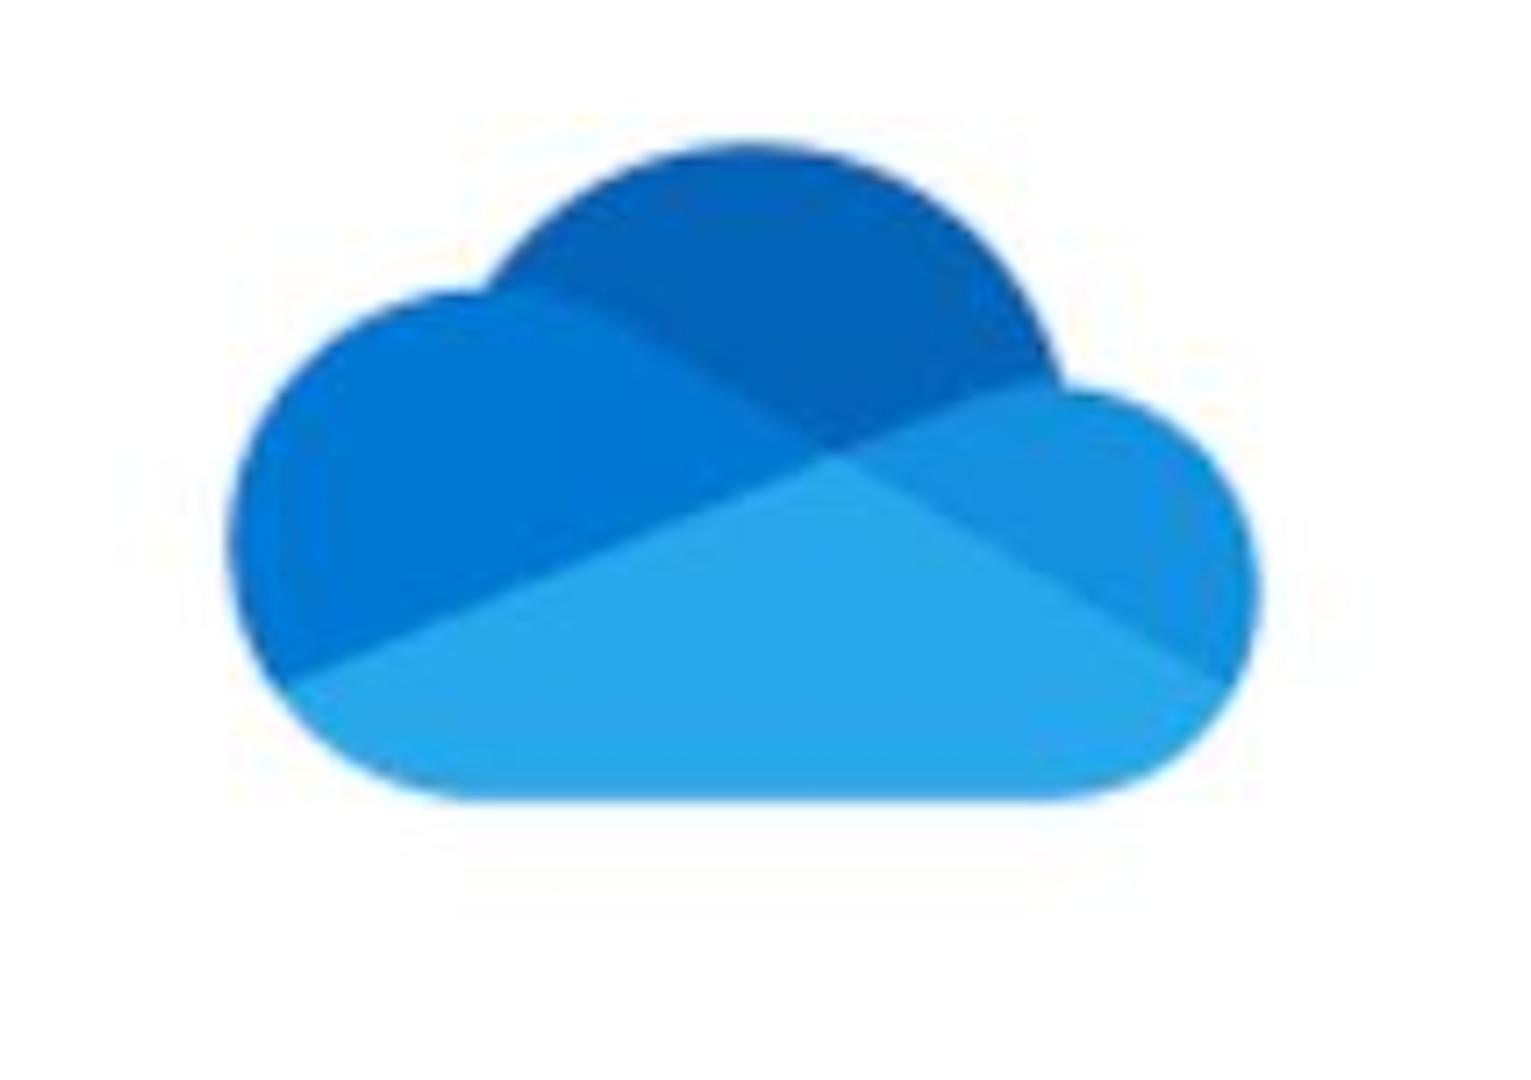 The Microsoft OneDrive logo